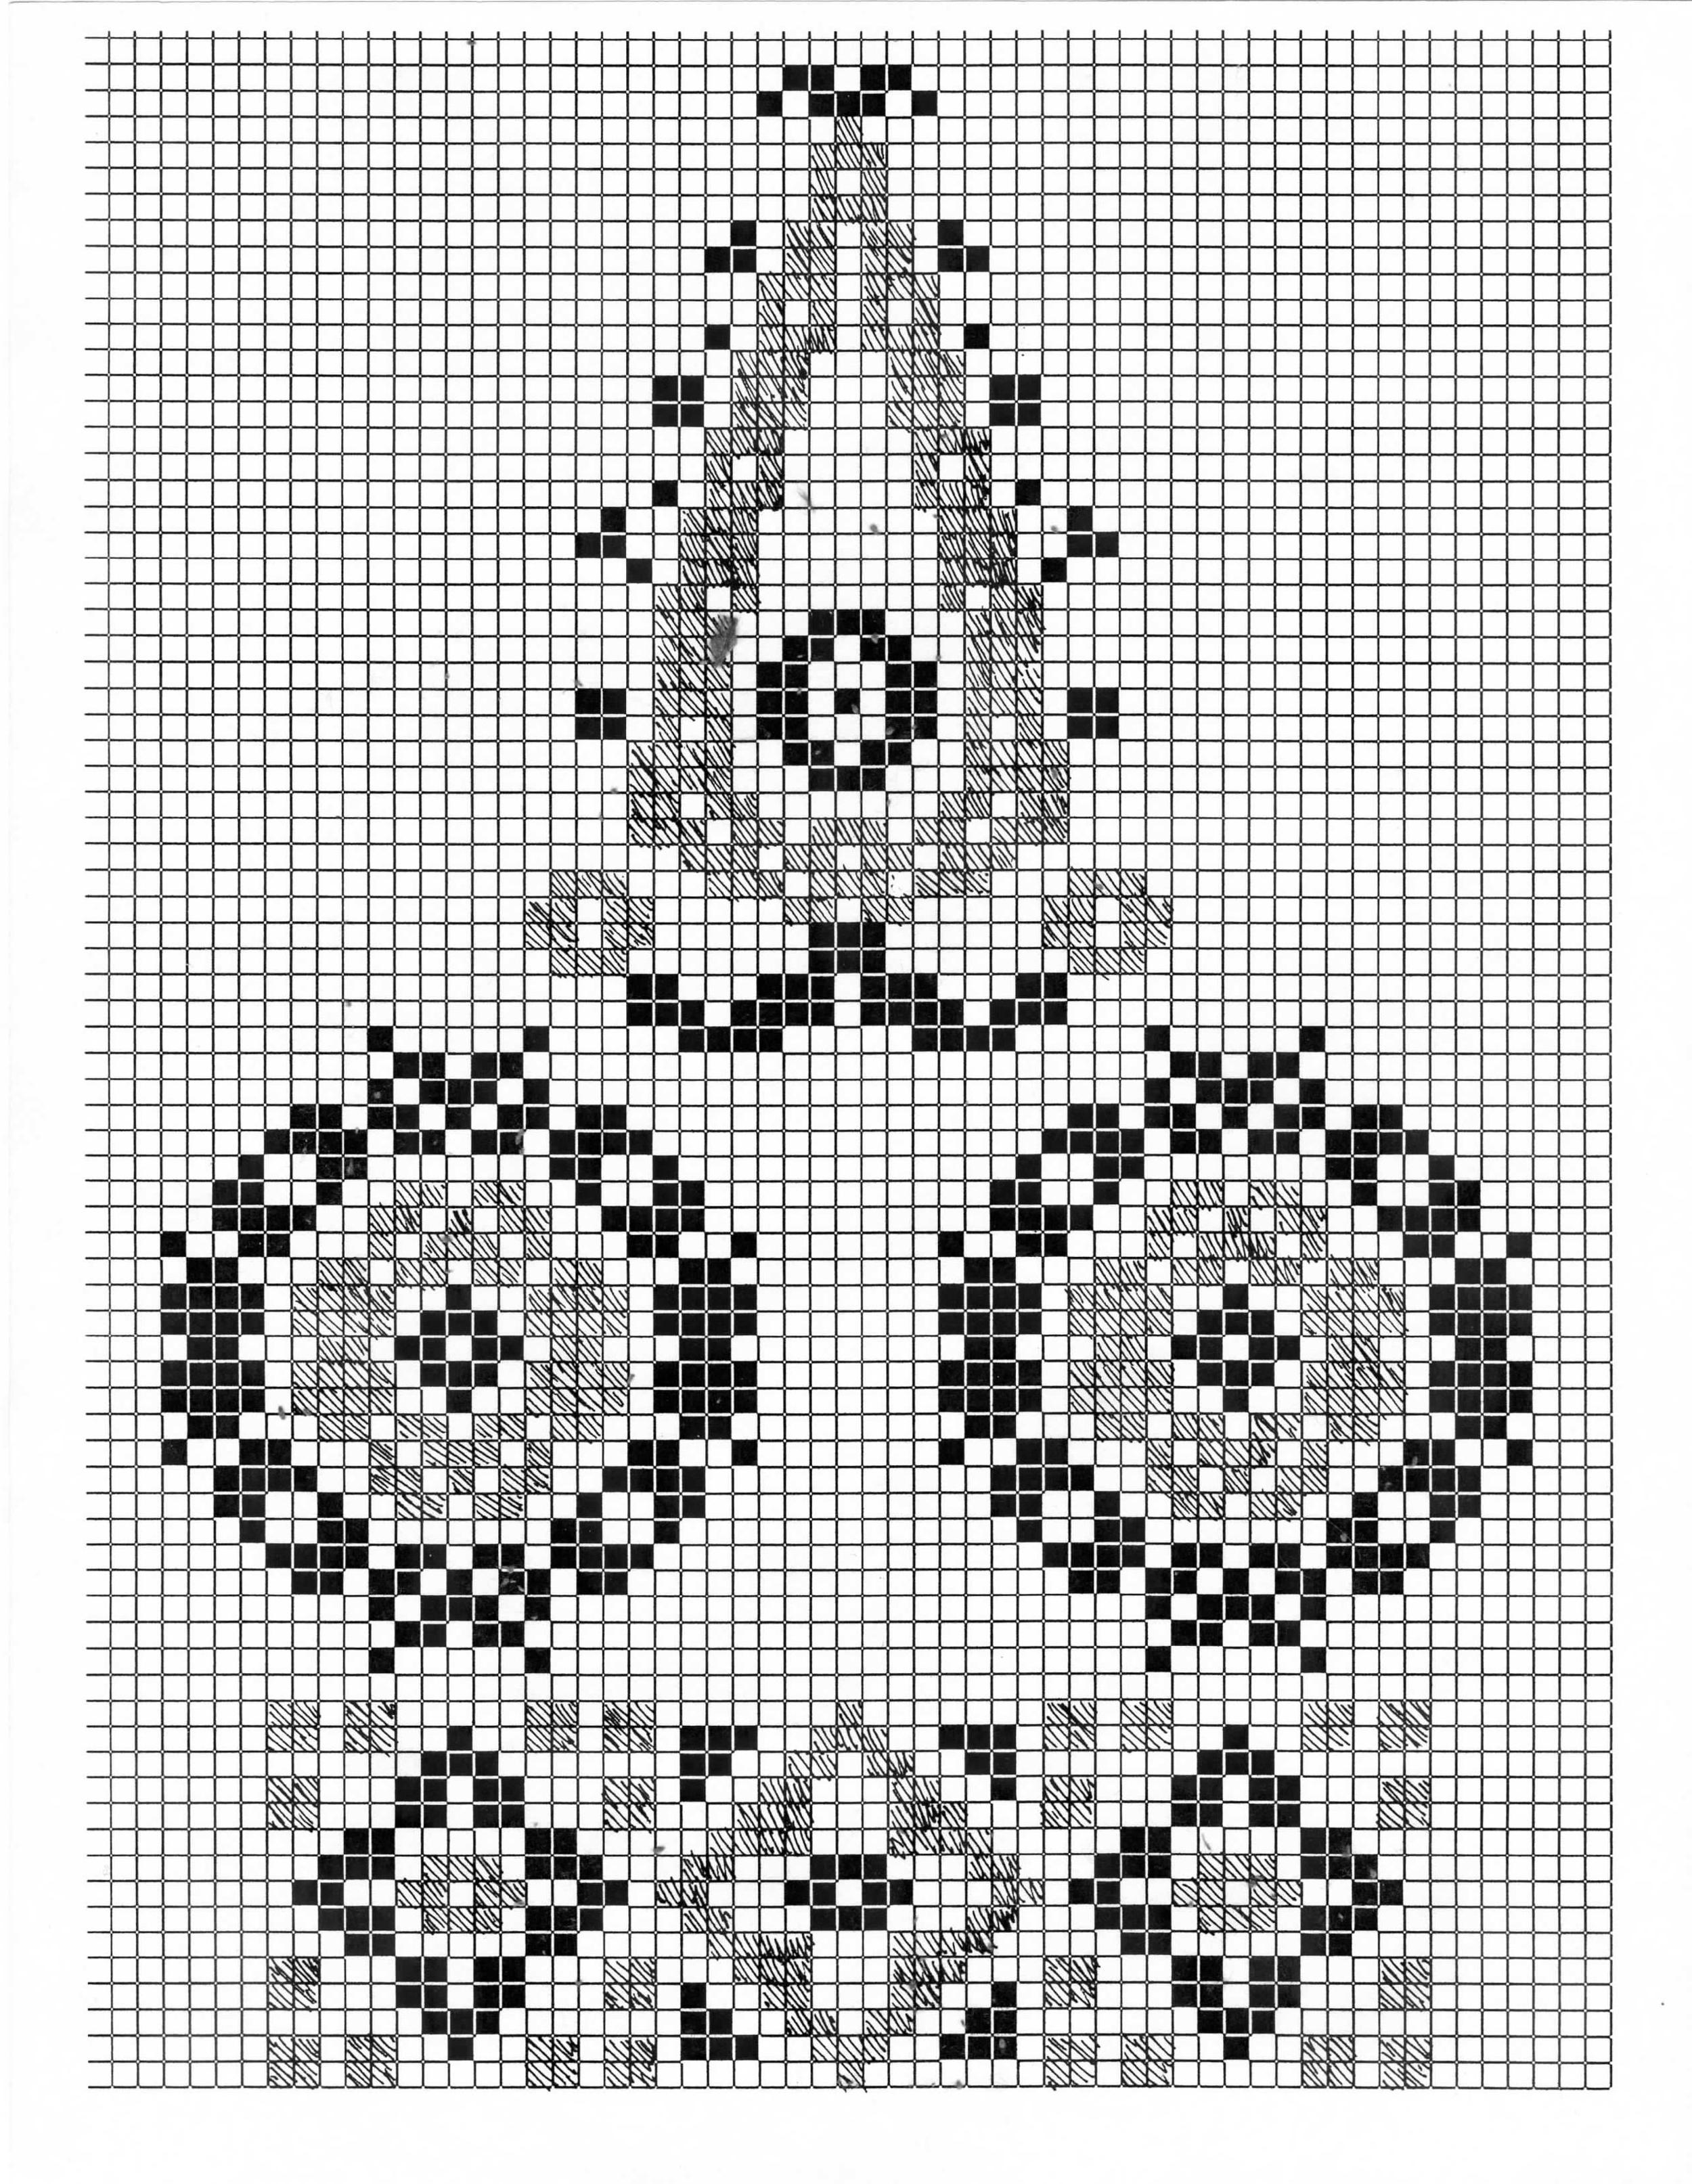 1997_Page_2_Image_0001.jpg